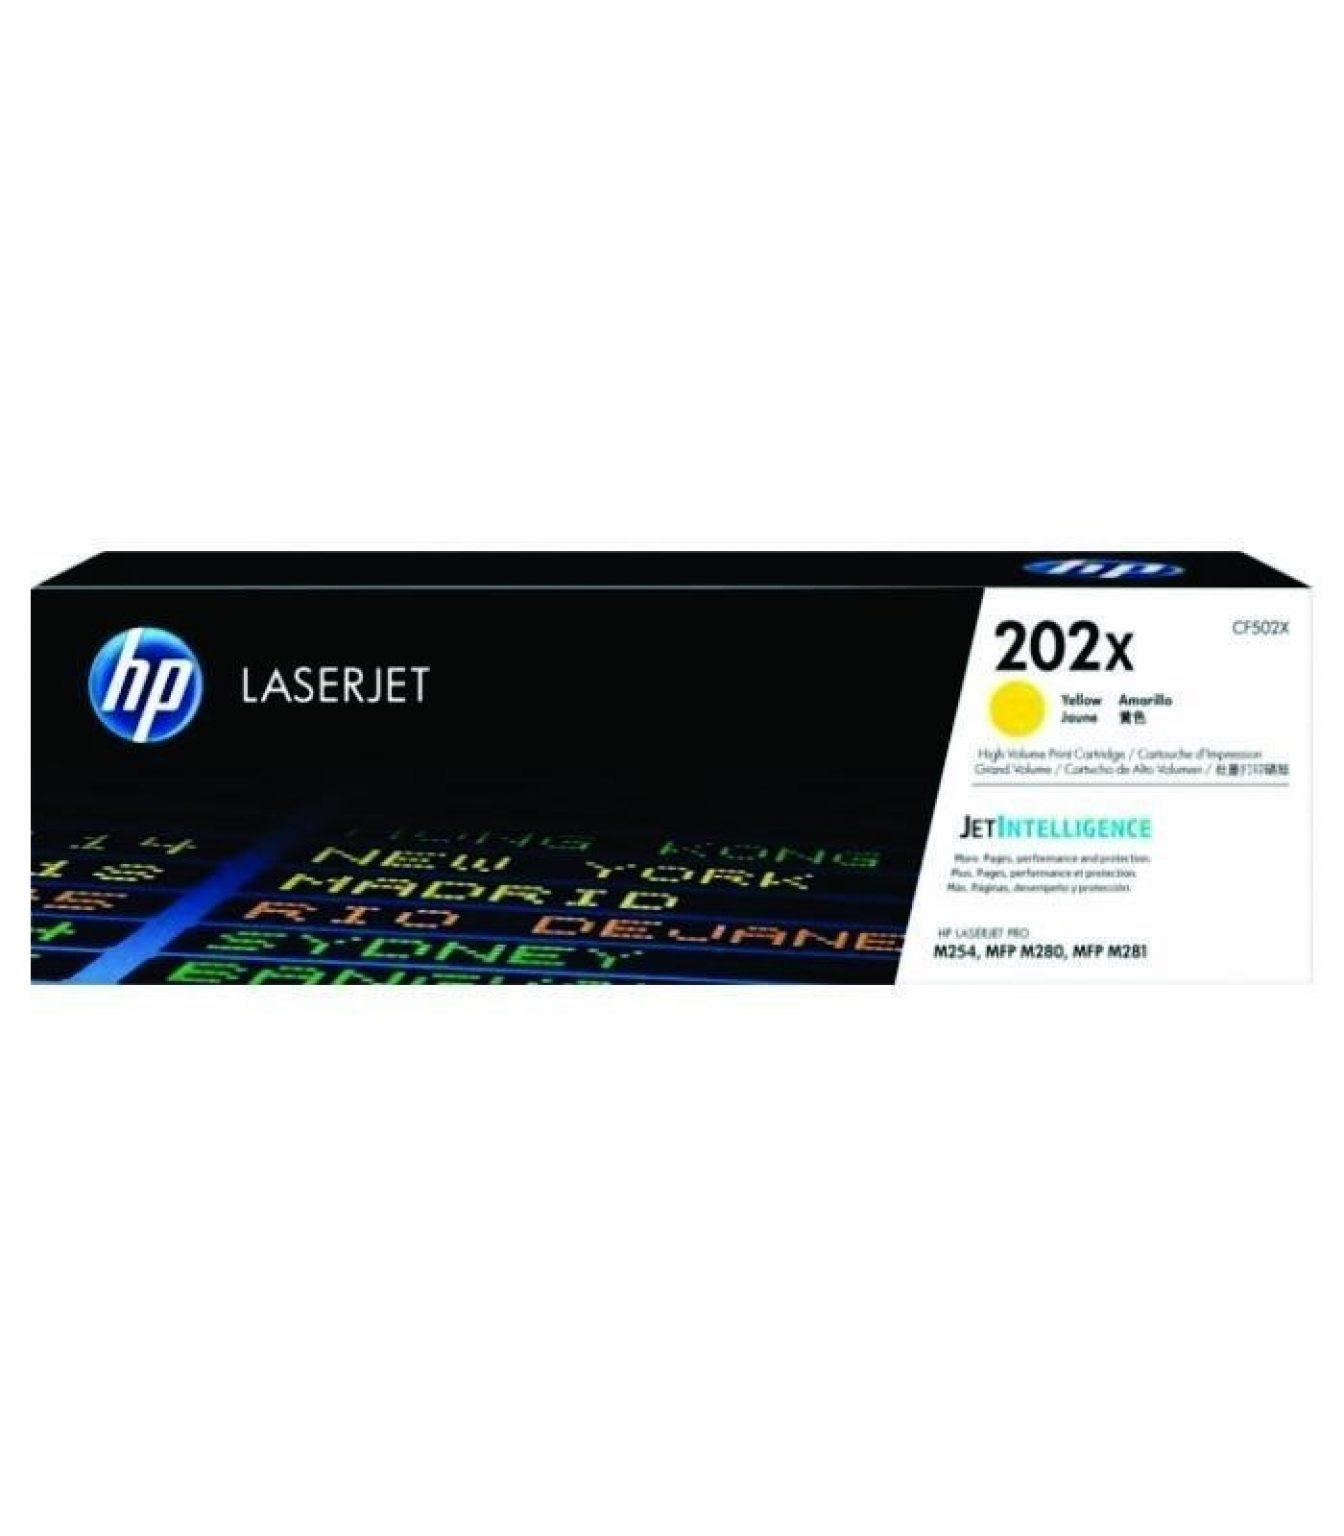 HP - 202X Yellow LaserJet Toner Cartridge [CF502X]